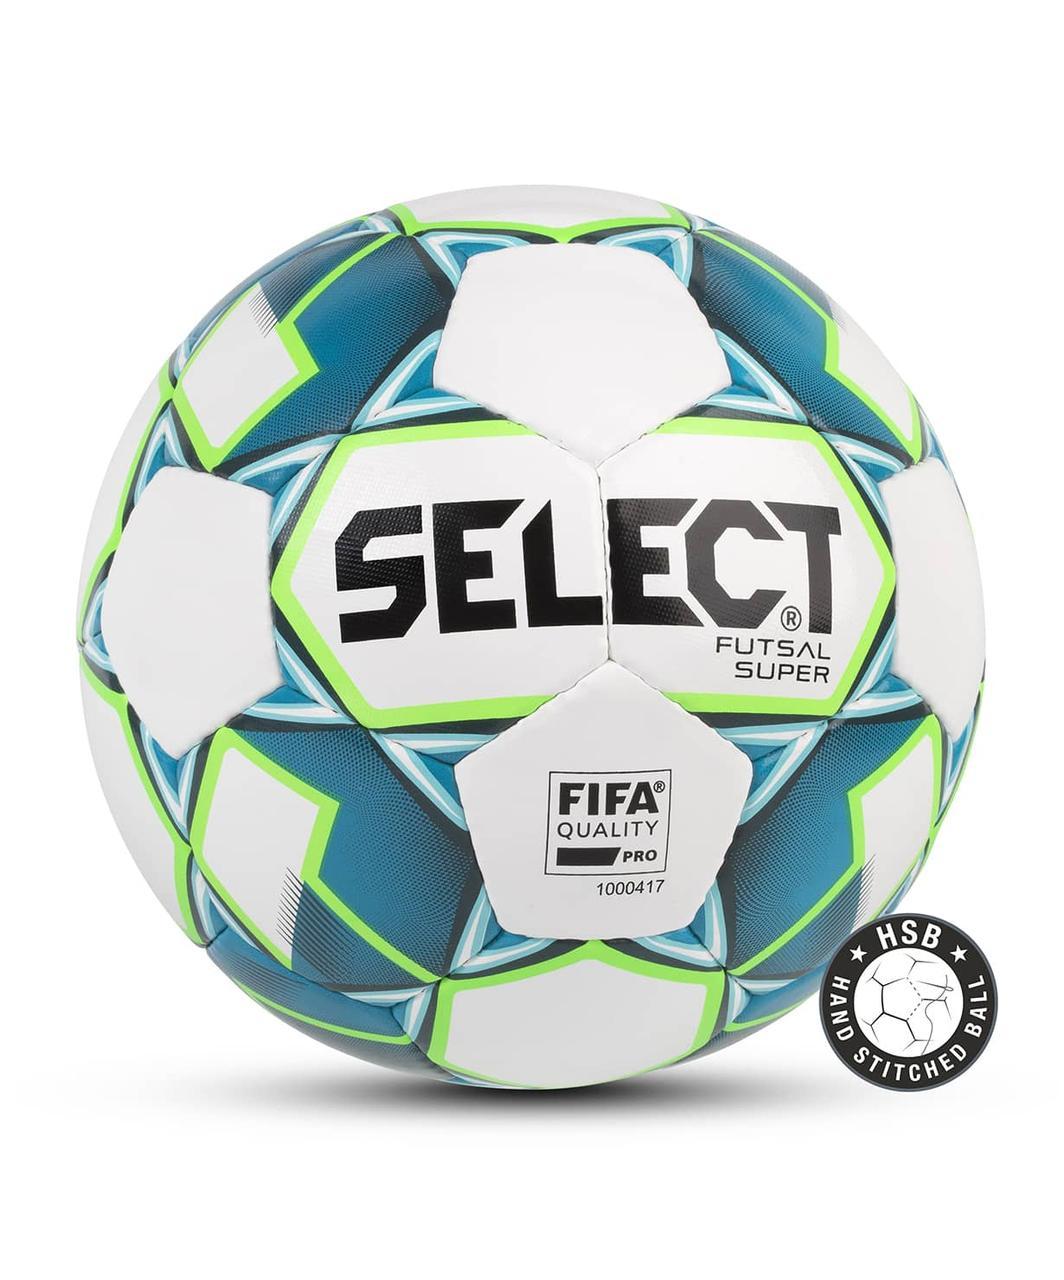 Мяч футзальный FUTSAL SUPER FIFA №4, бел/син/зел Select